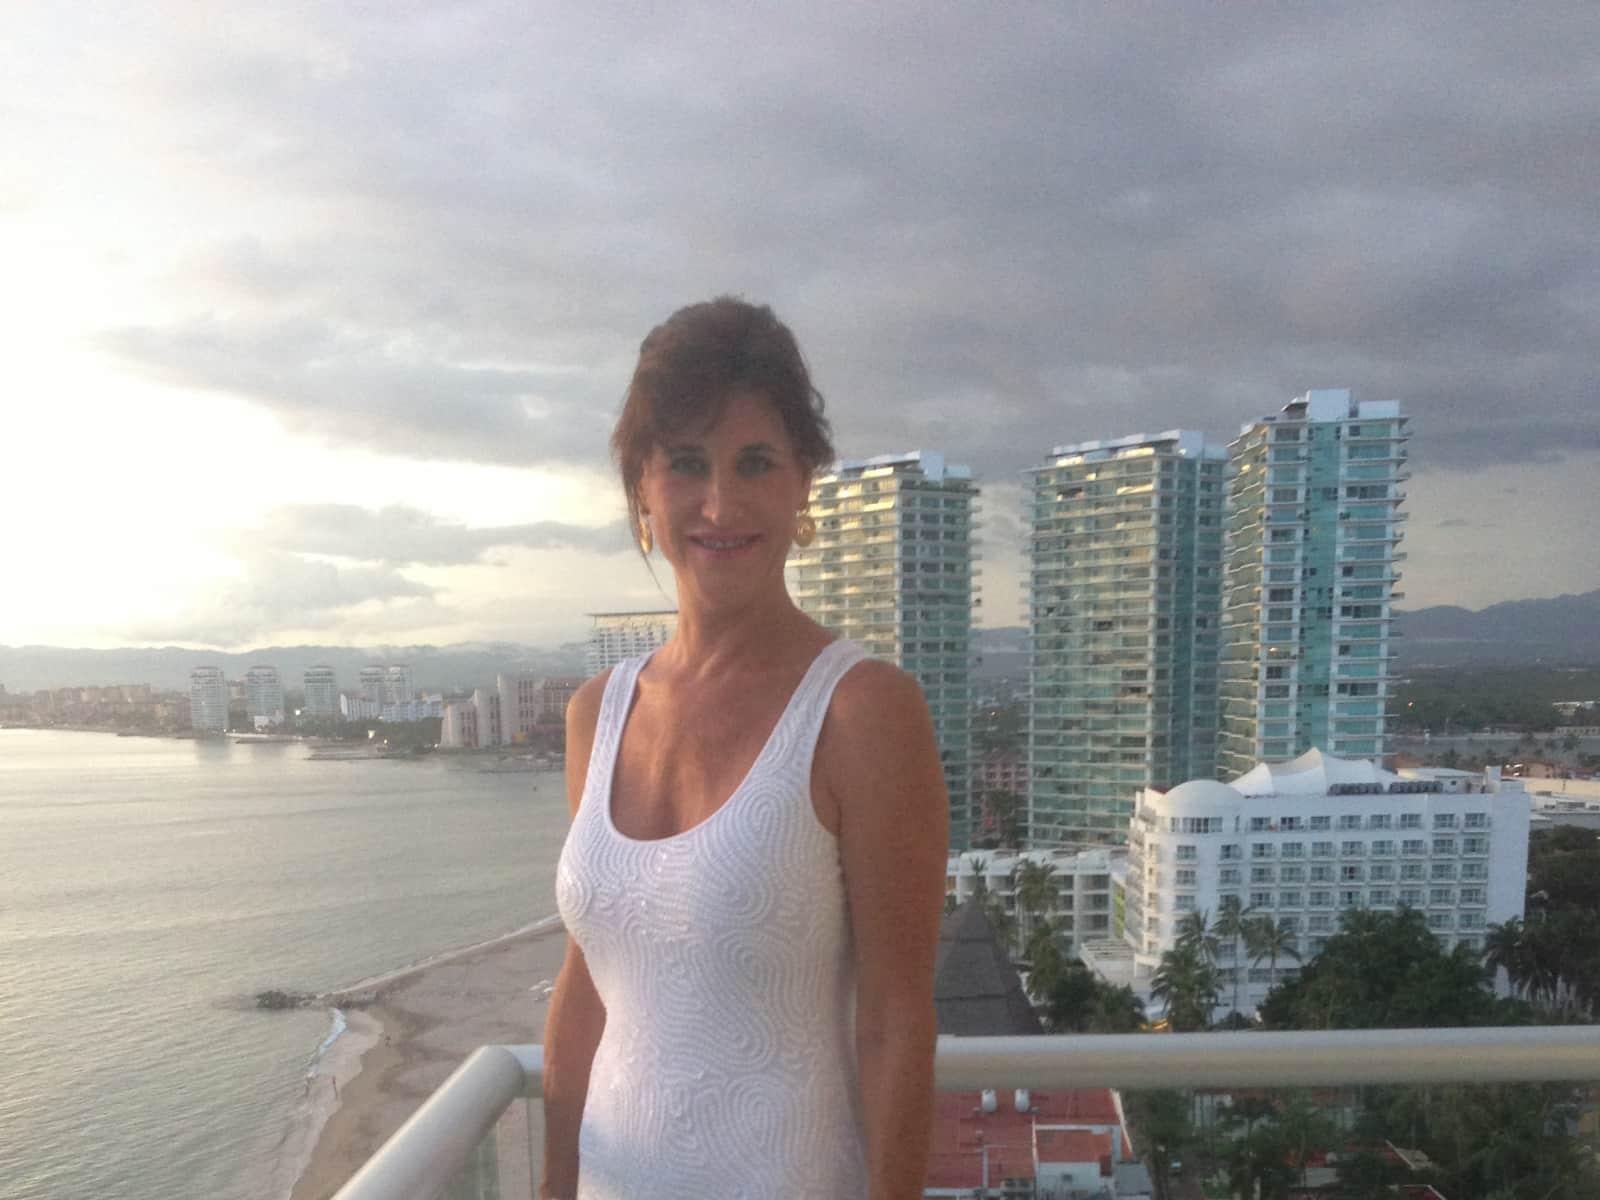 Celia from Puerto Vallarta, Mexico